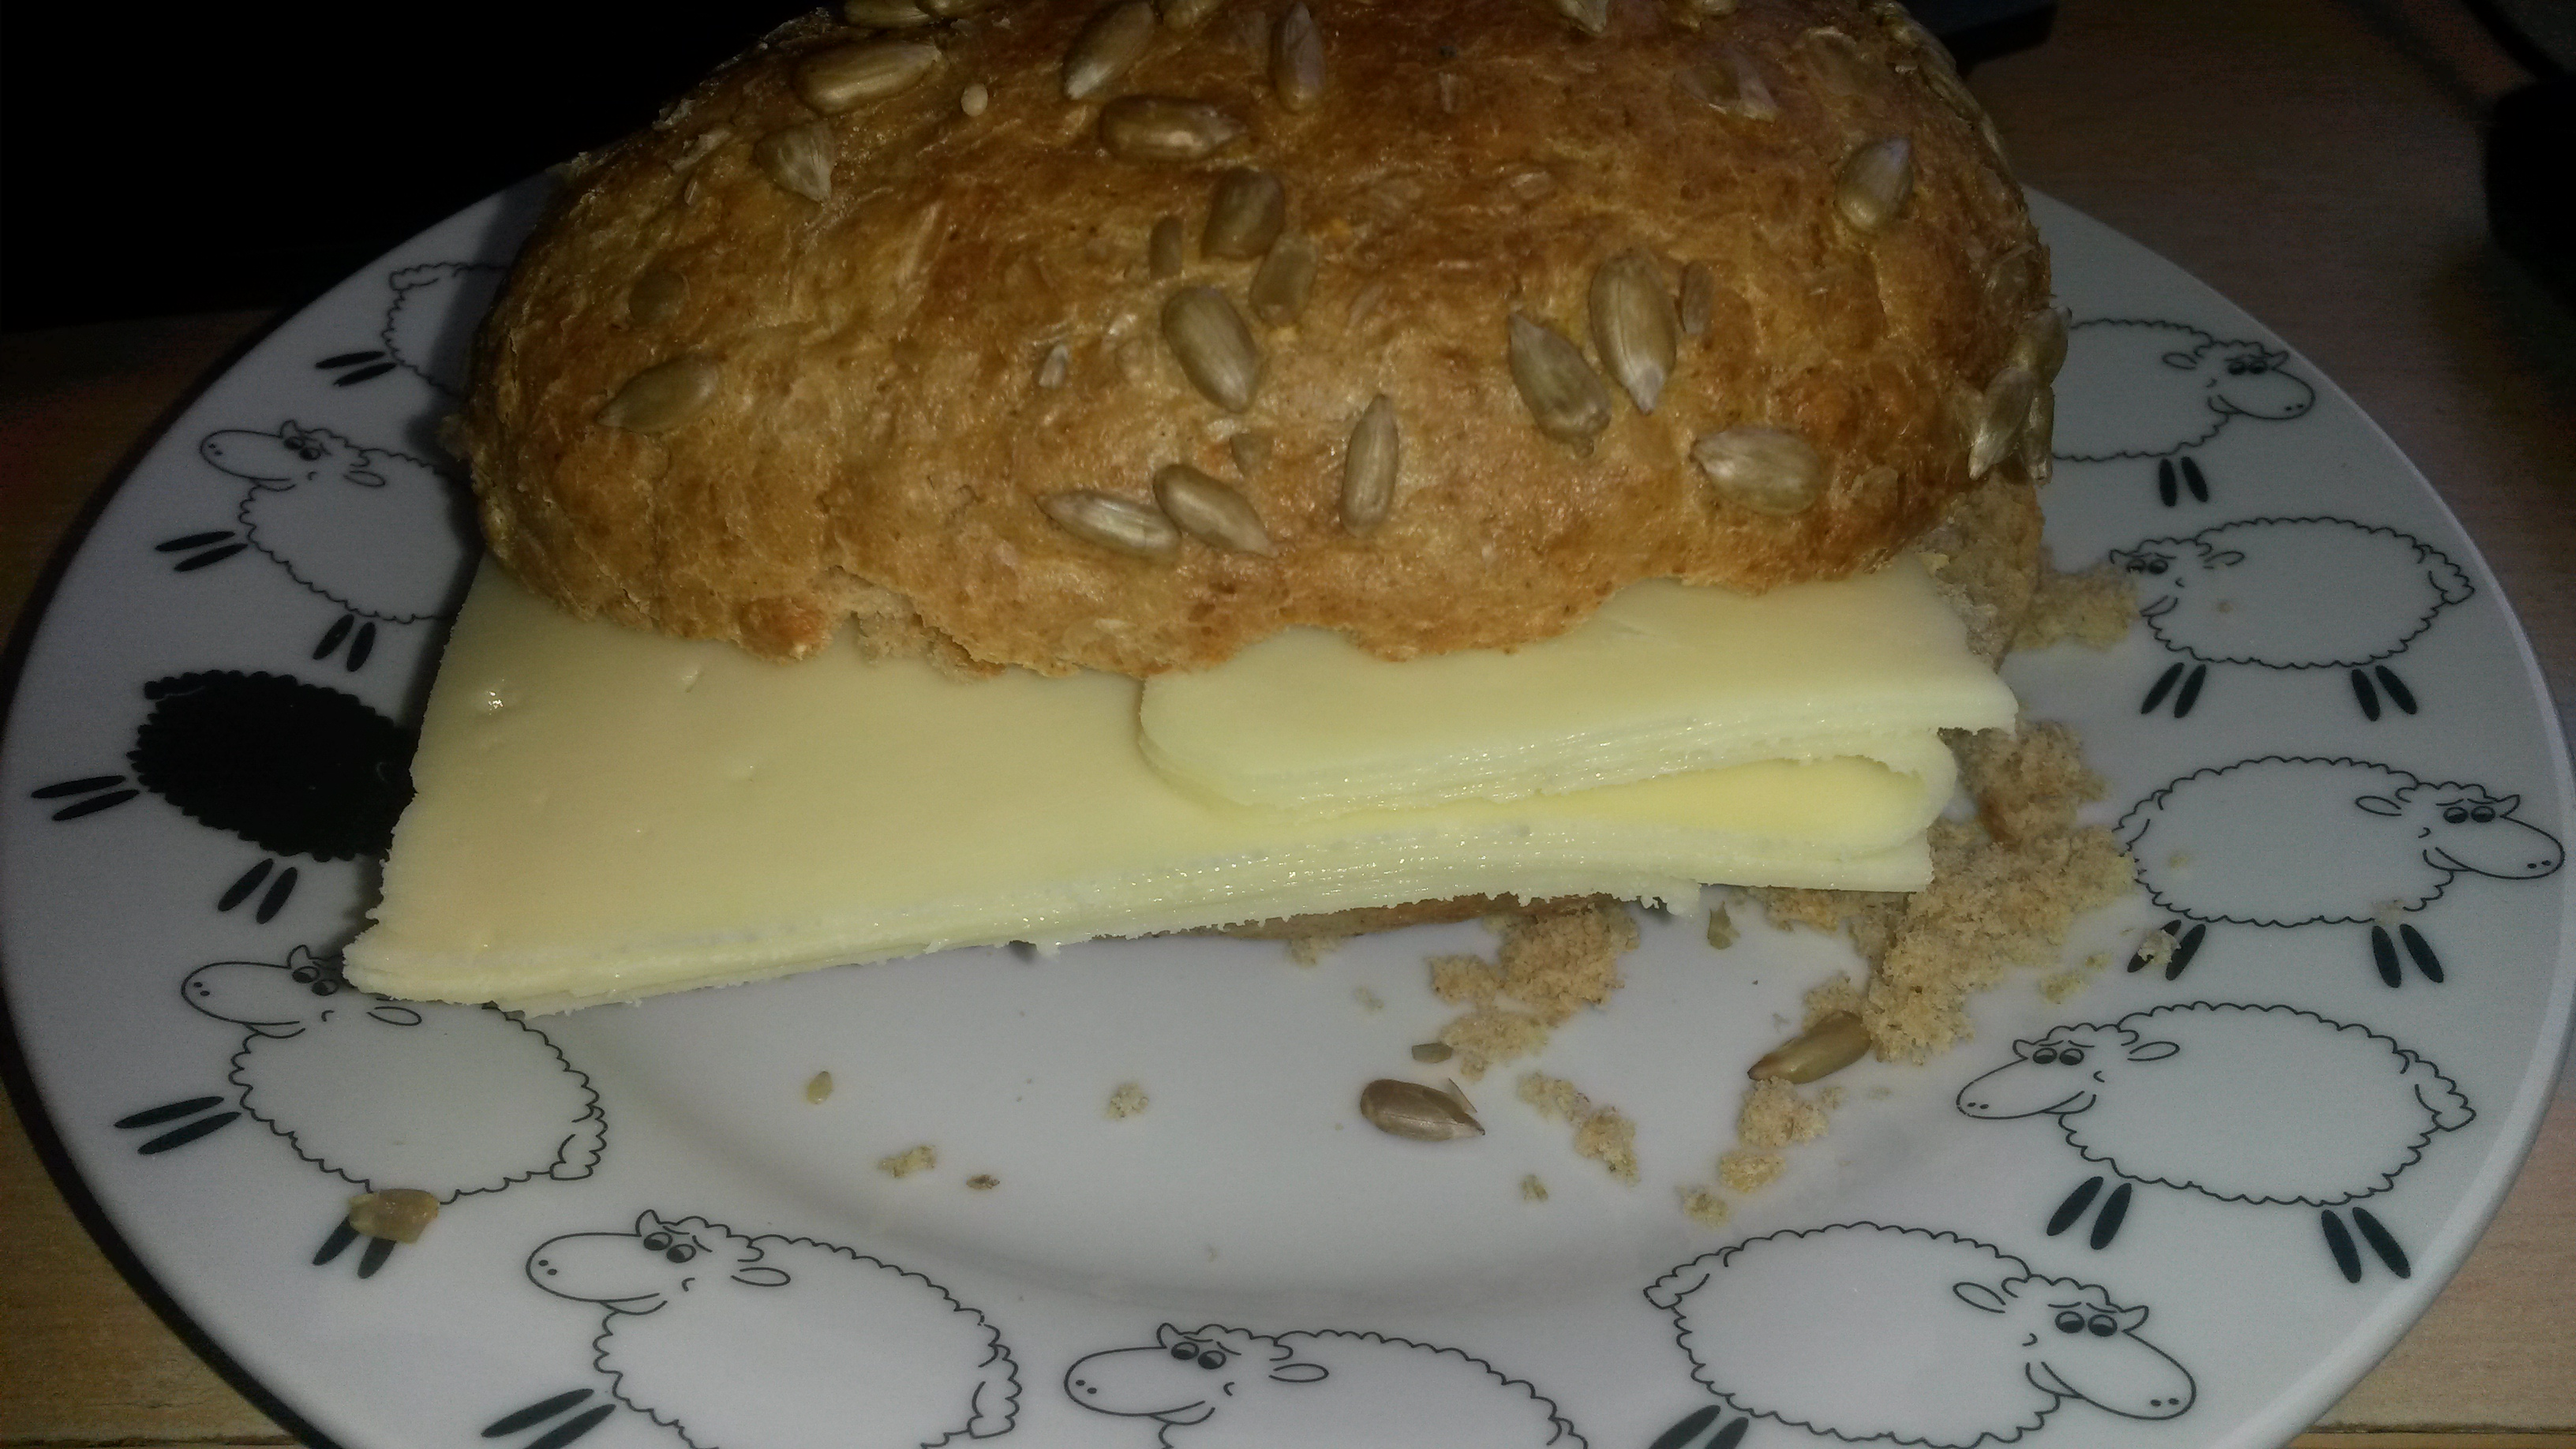 http://foodloader.net/sk0r_2014-04-12_Kaesebroetchen____.jpg